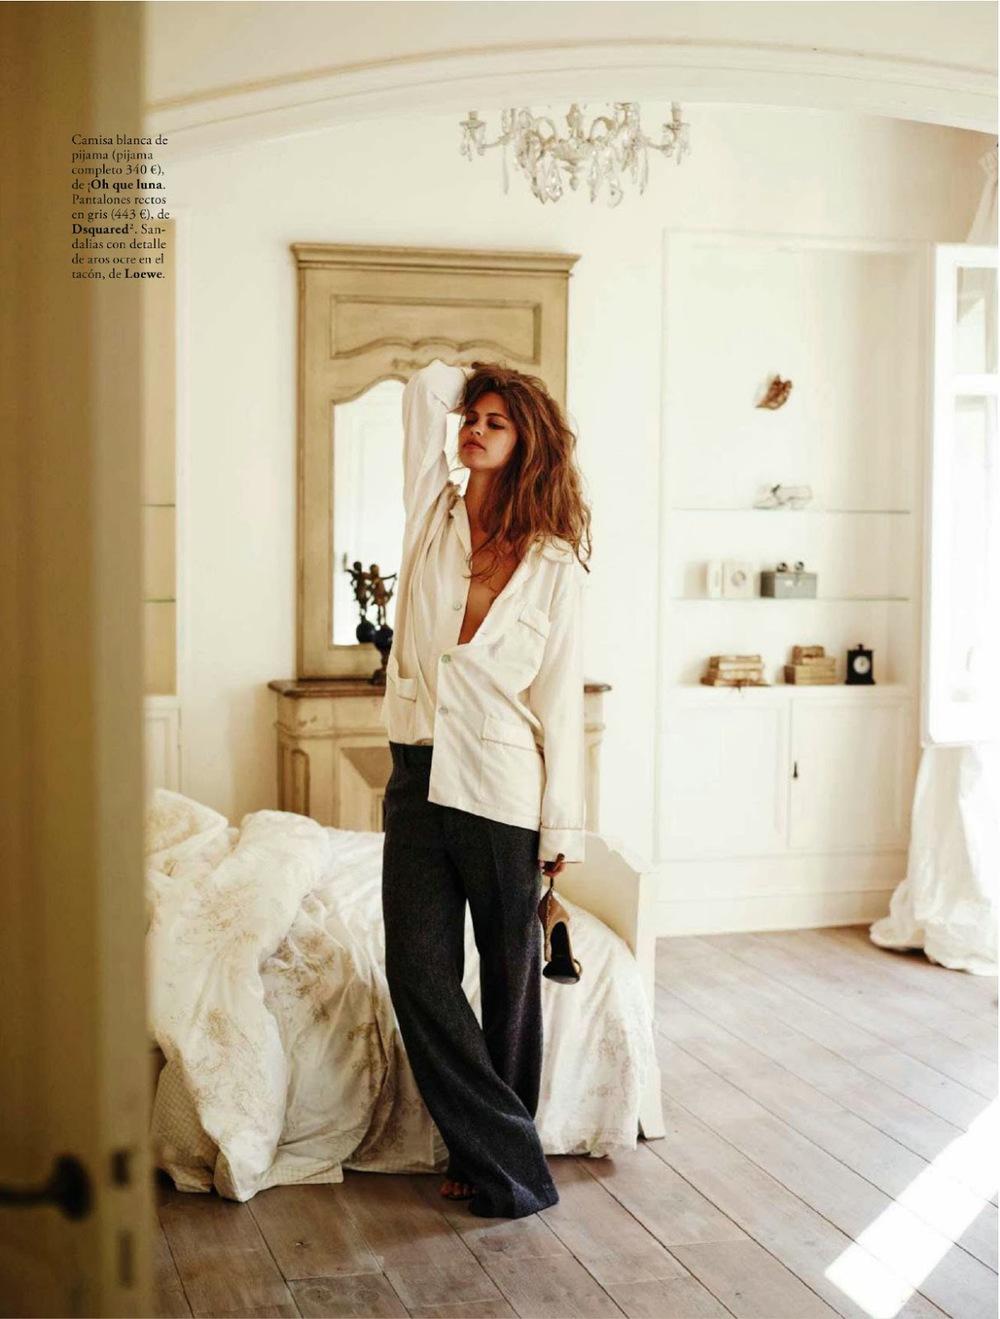 Elle_Spain_Noviembre_2013 (dragged) 21.jpg